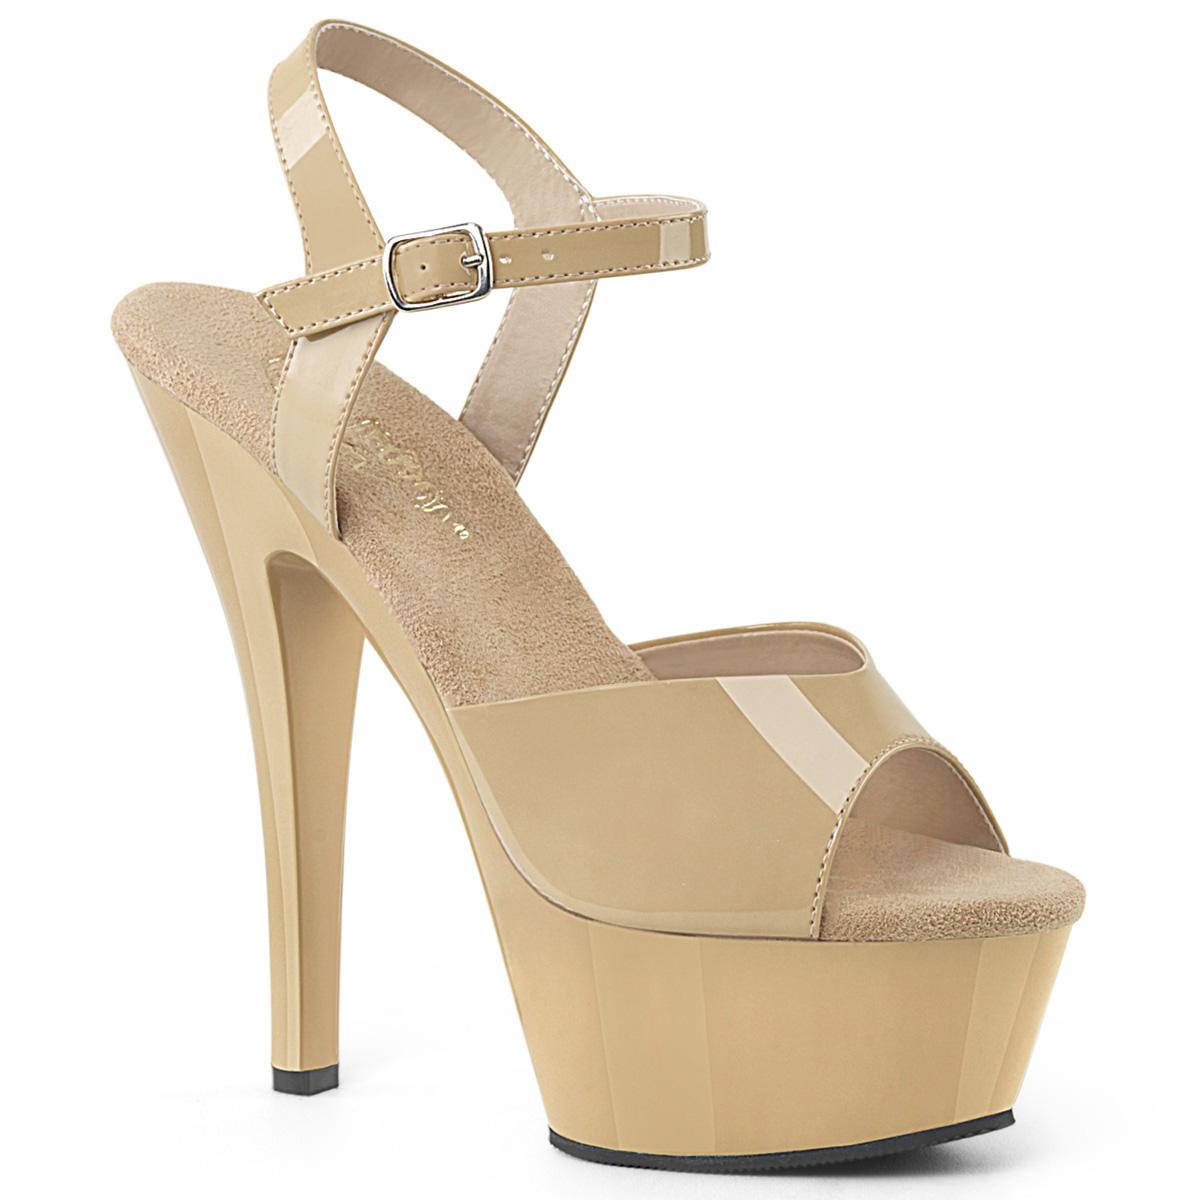 ec30c5f5c73b Platform High Heels KISS-209 - Patent Cream